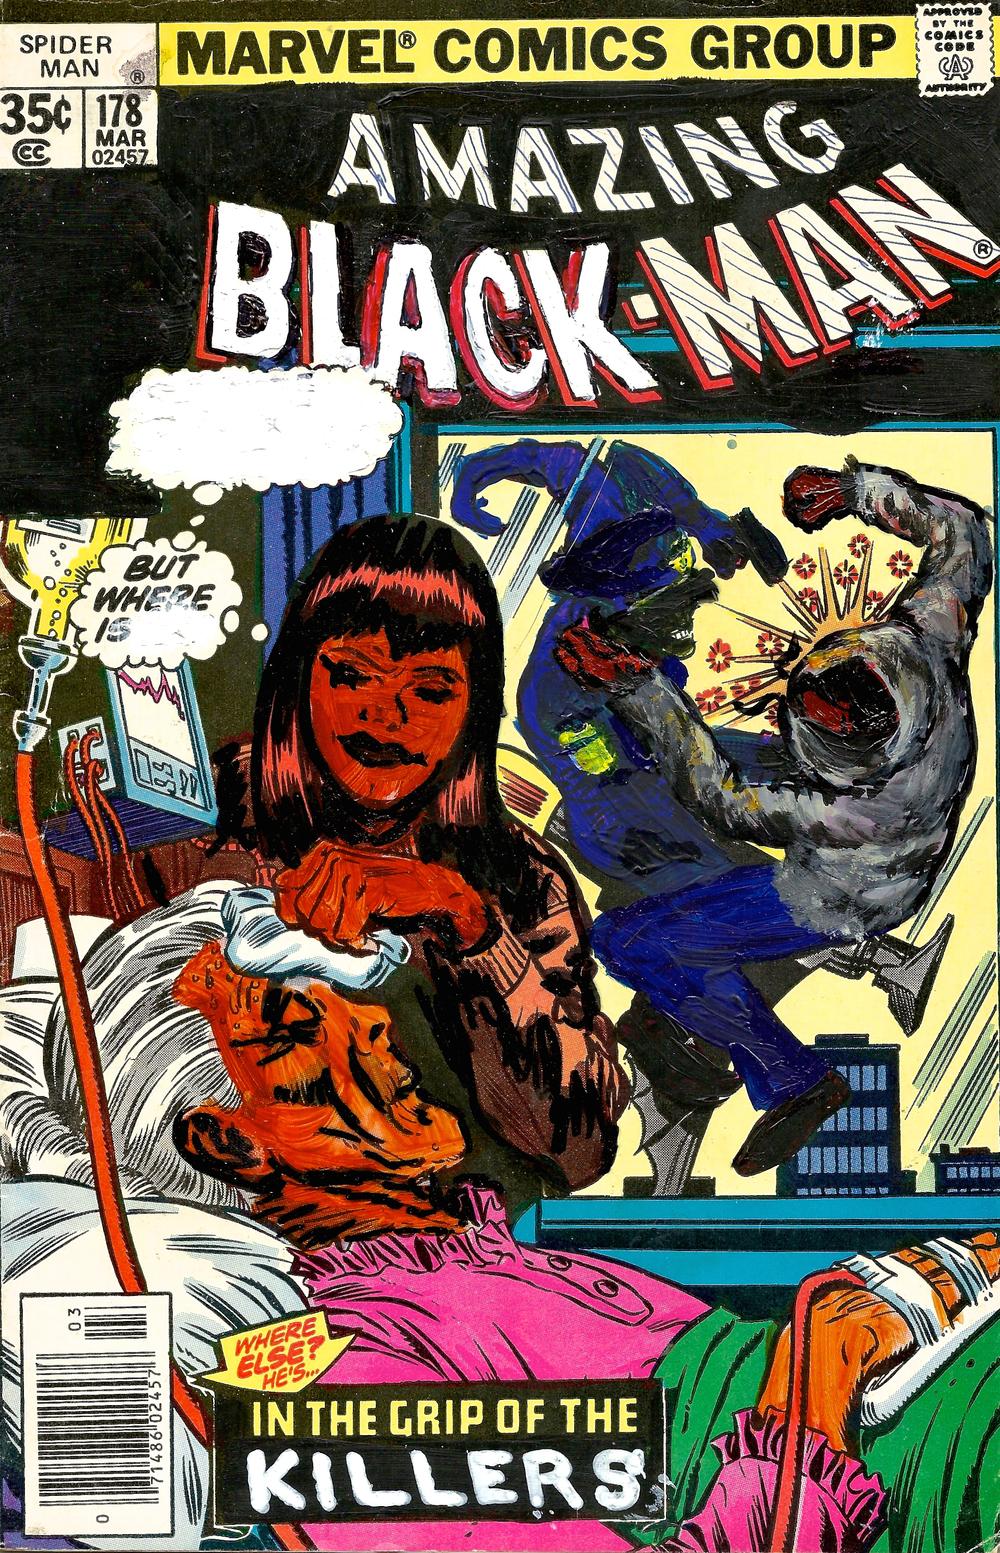 The Amazing Black-Man #178